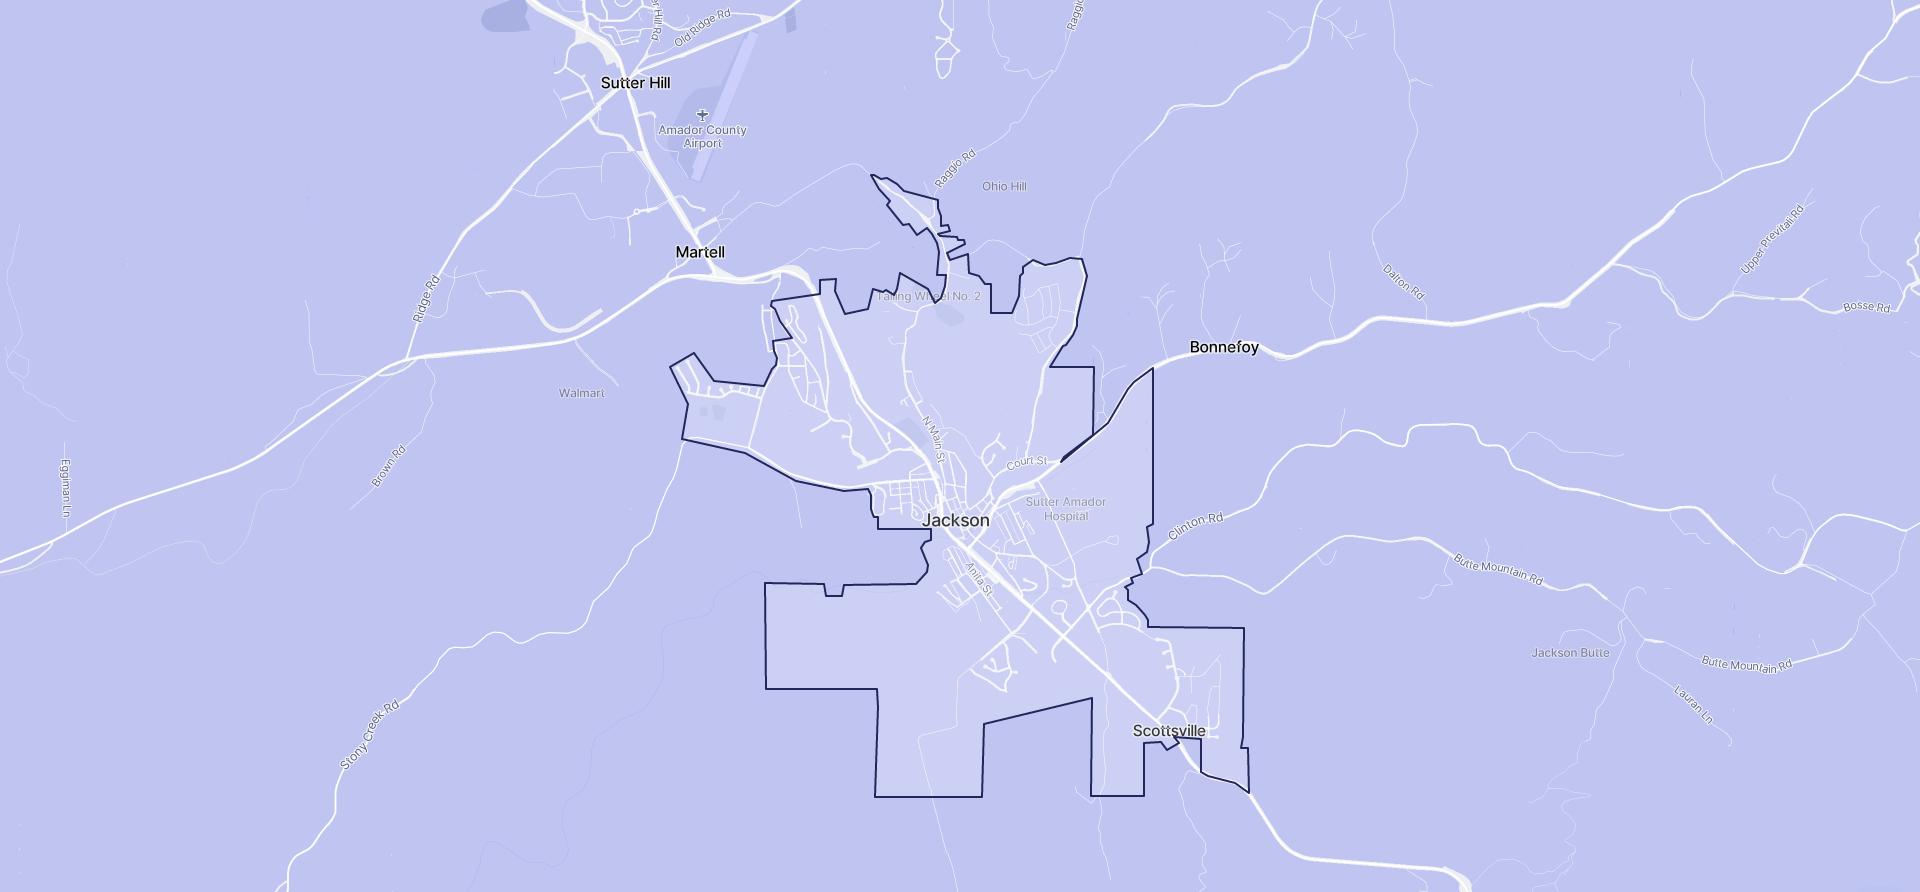 Image of Jackson boundaries on a map.